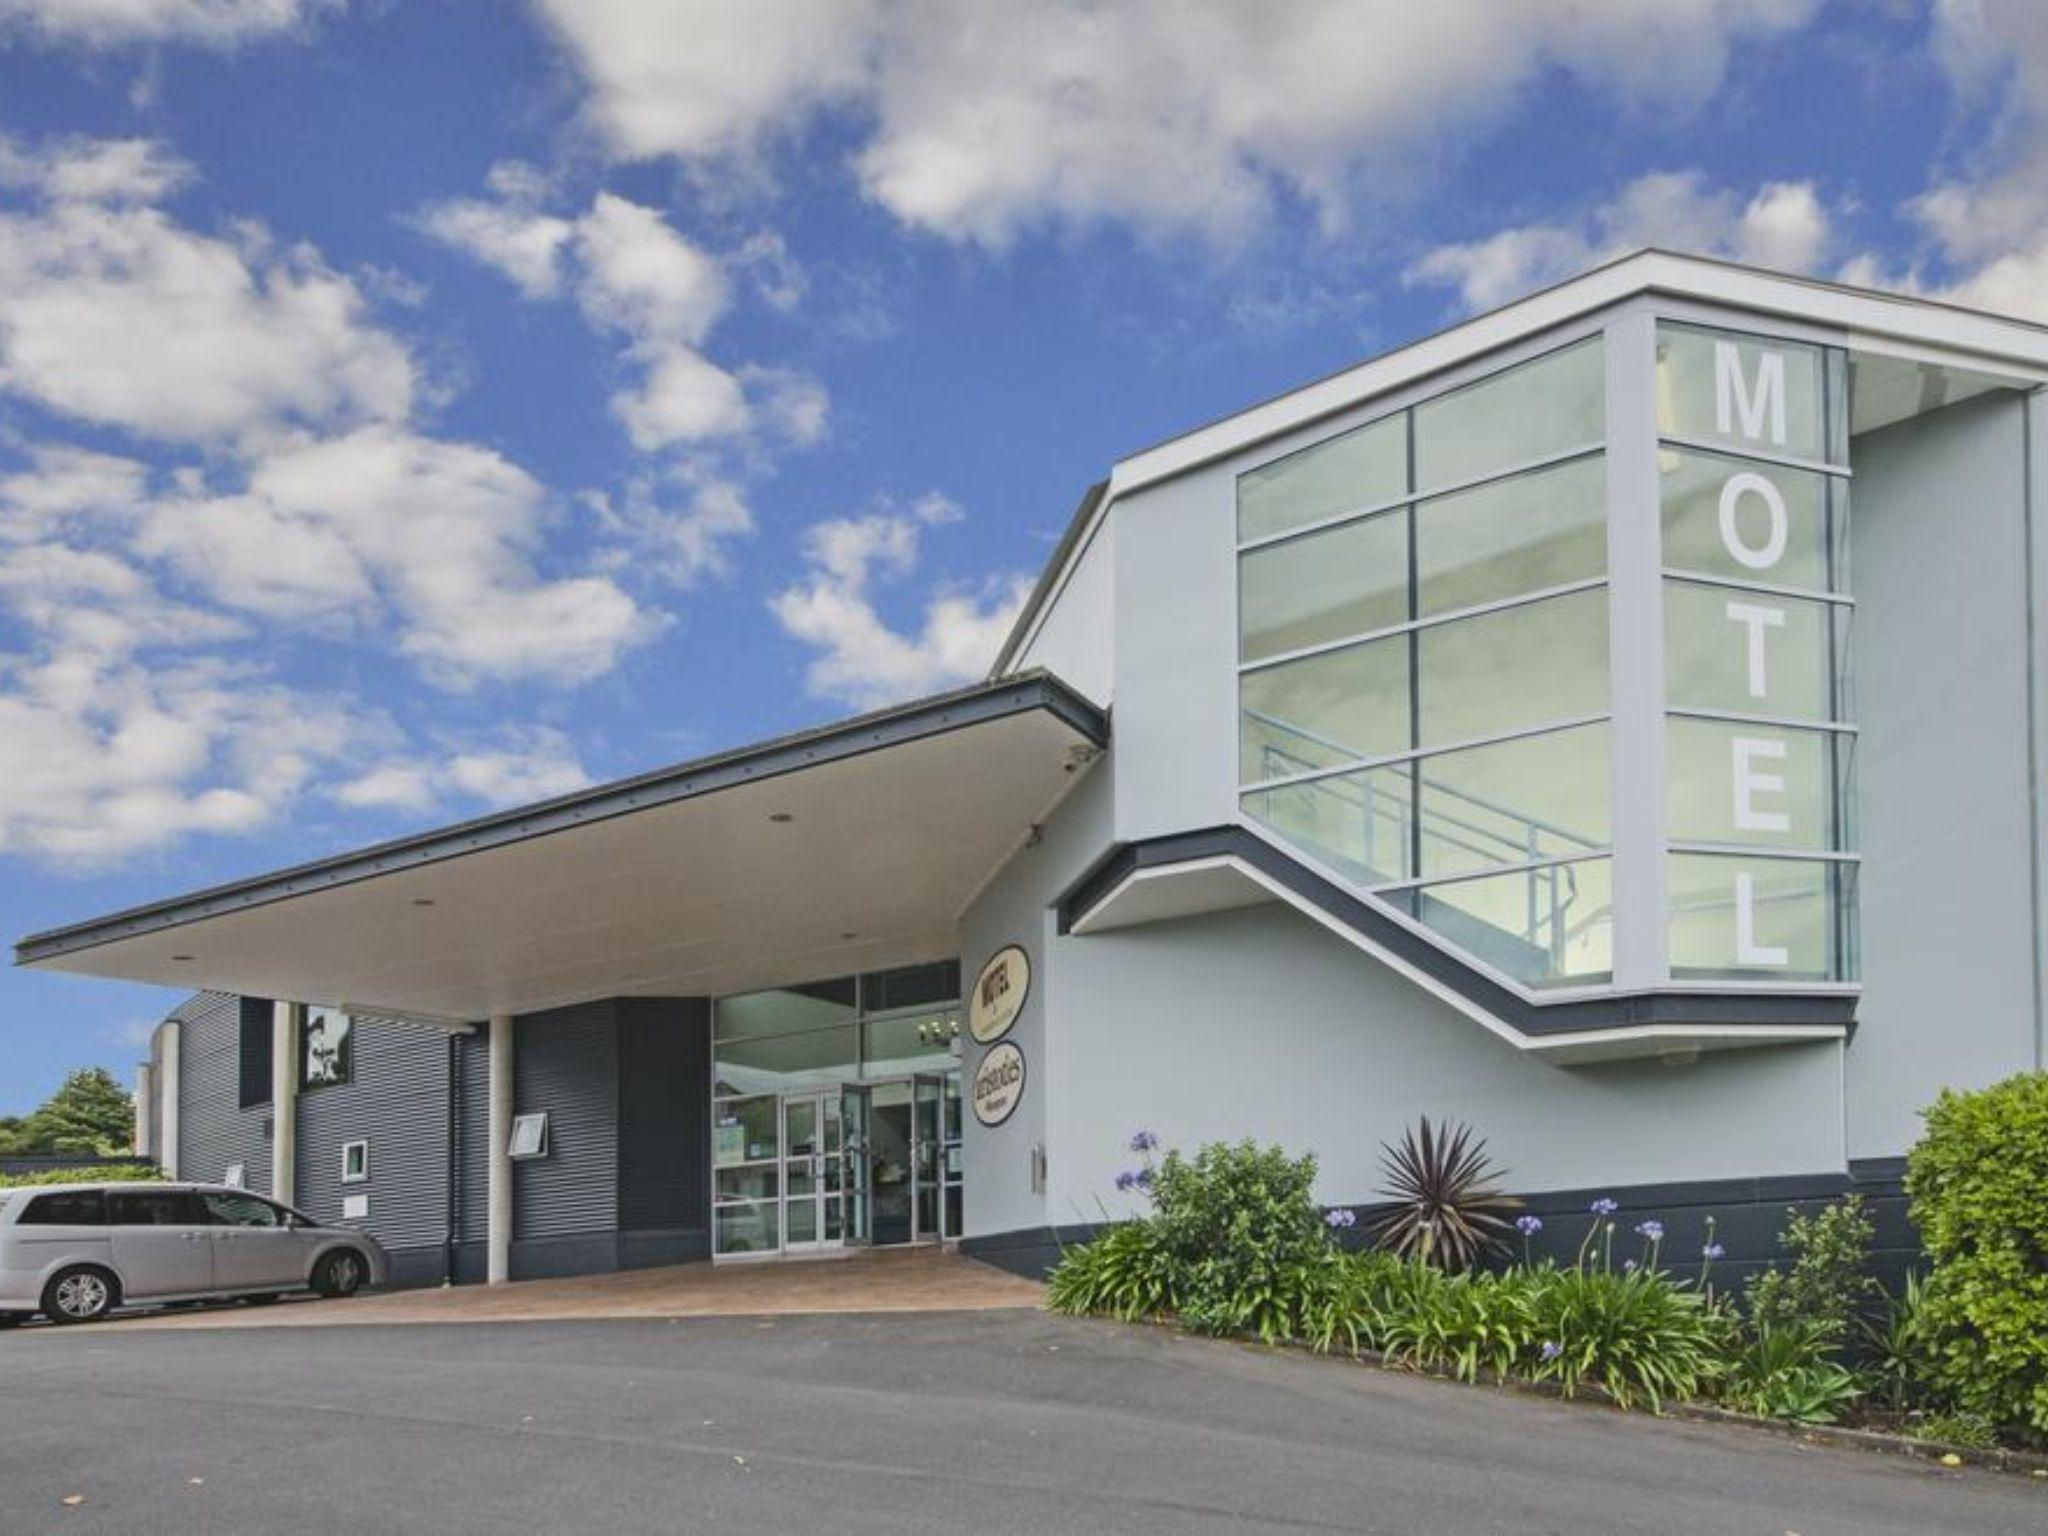 Aristotles North Shore Motel Auckland